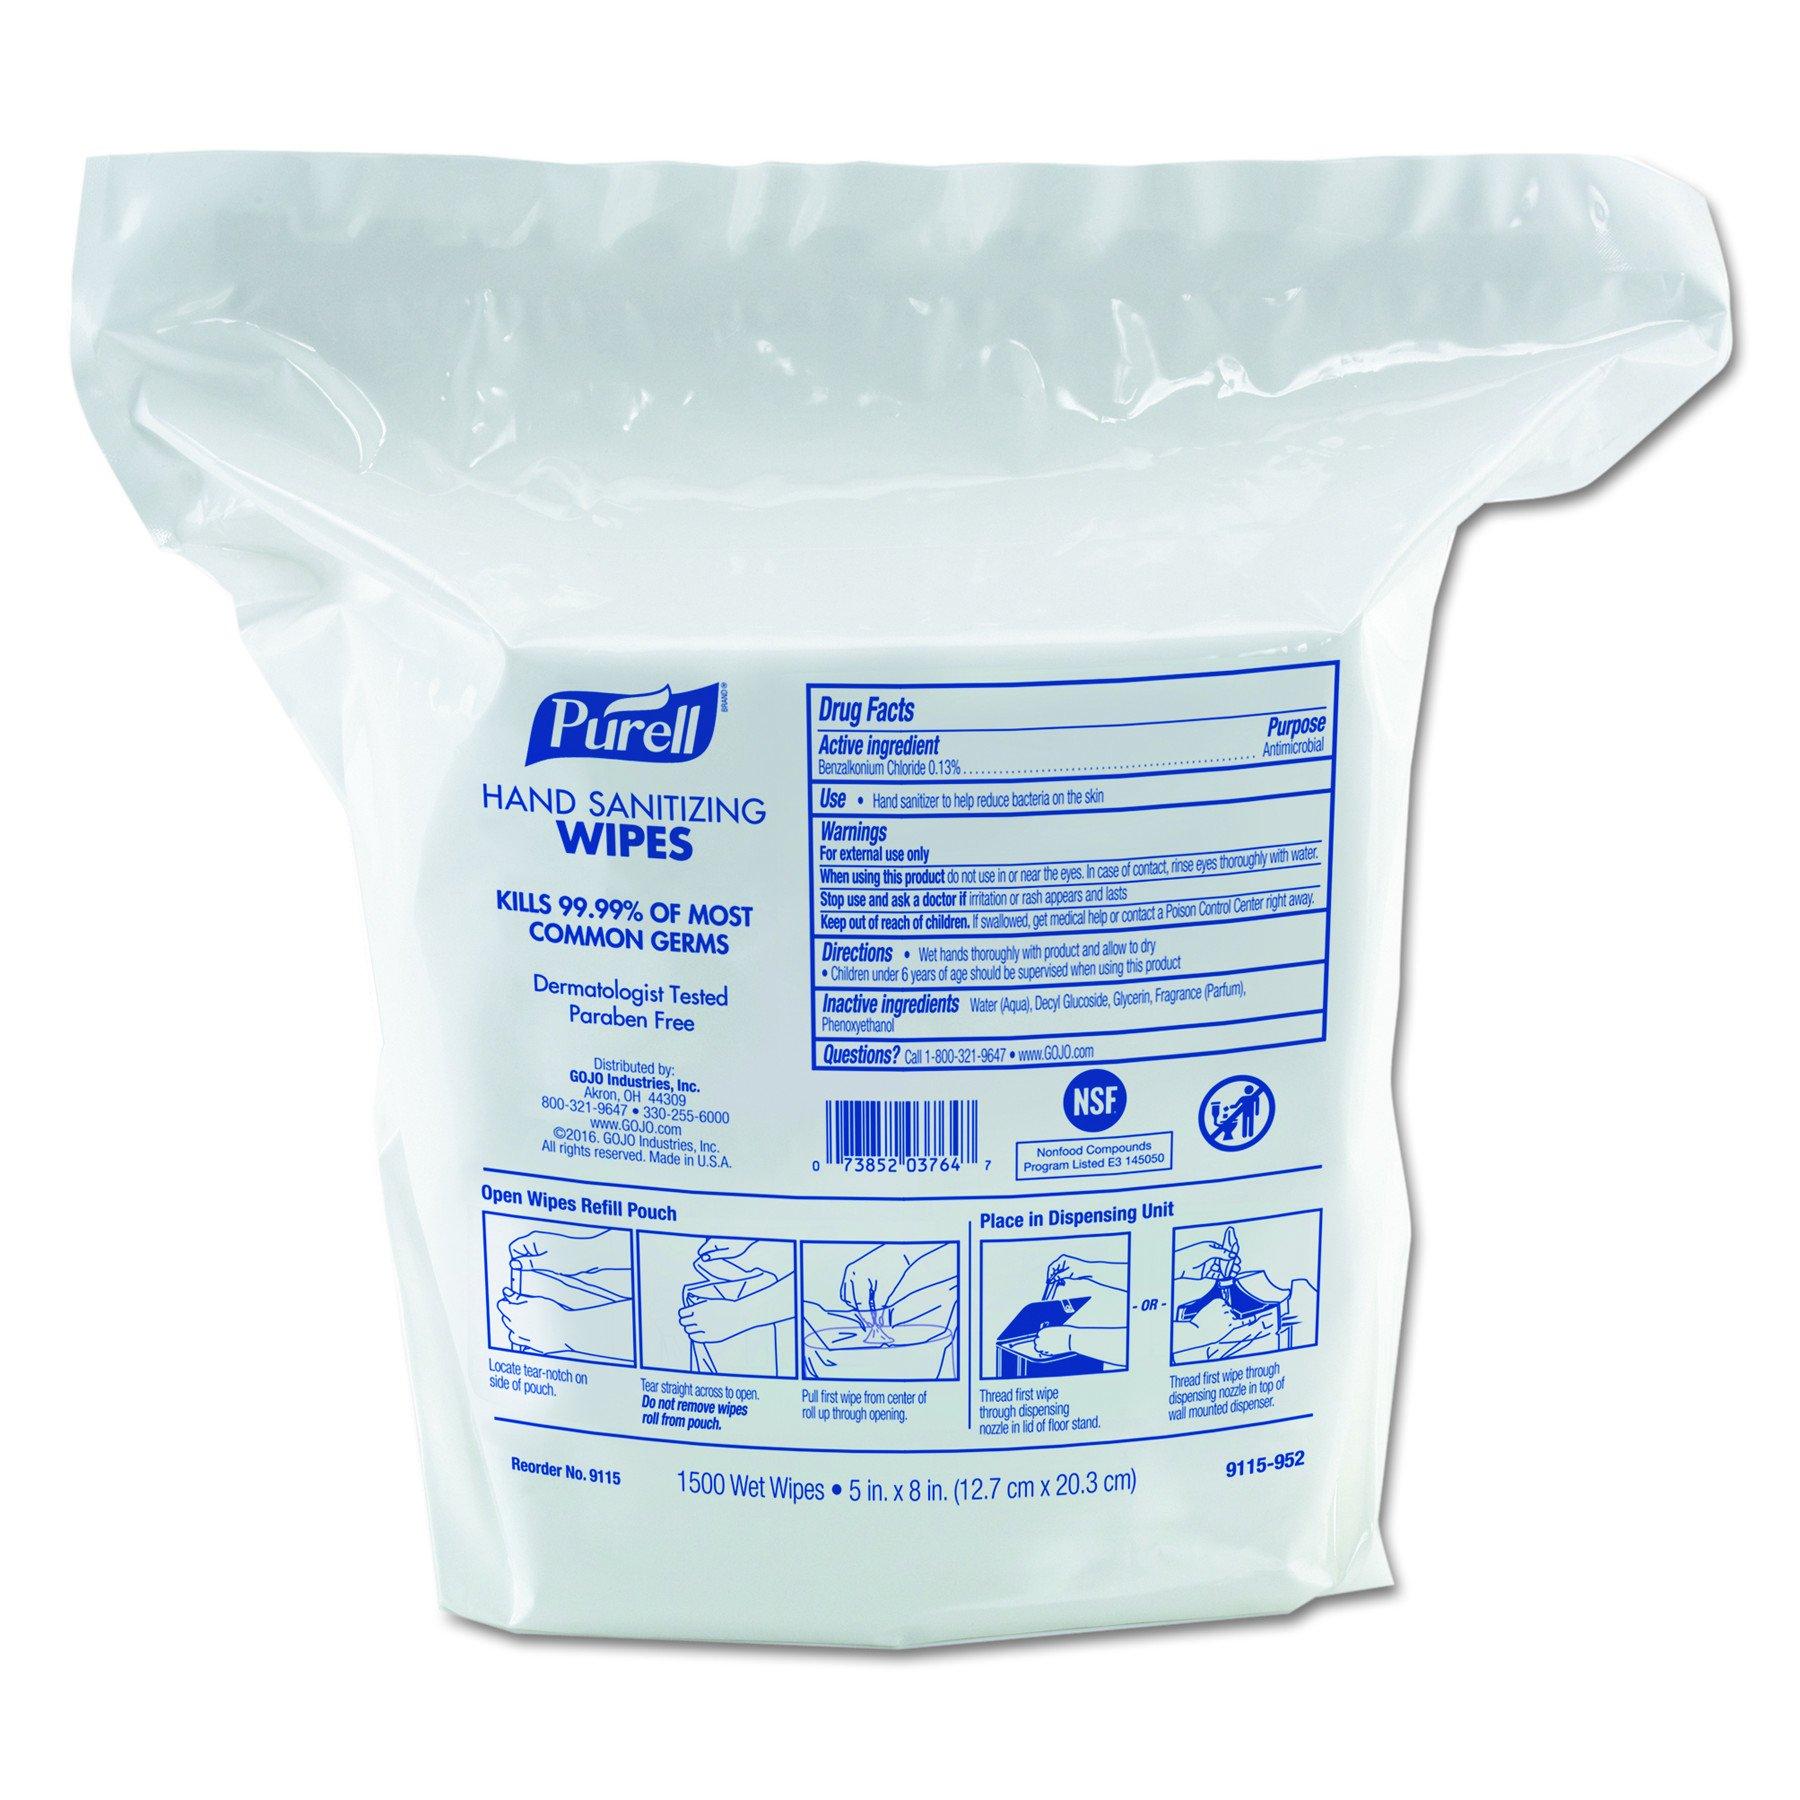 PURELL 9115-02 Premoistened Hand Sanitizing Wipes, Nonwoven Fiber, 5'' x 8'' (Pack of 120)